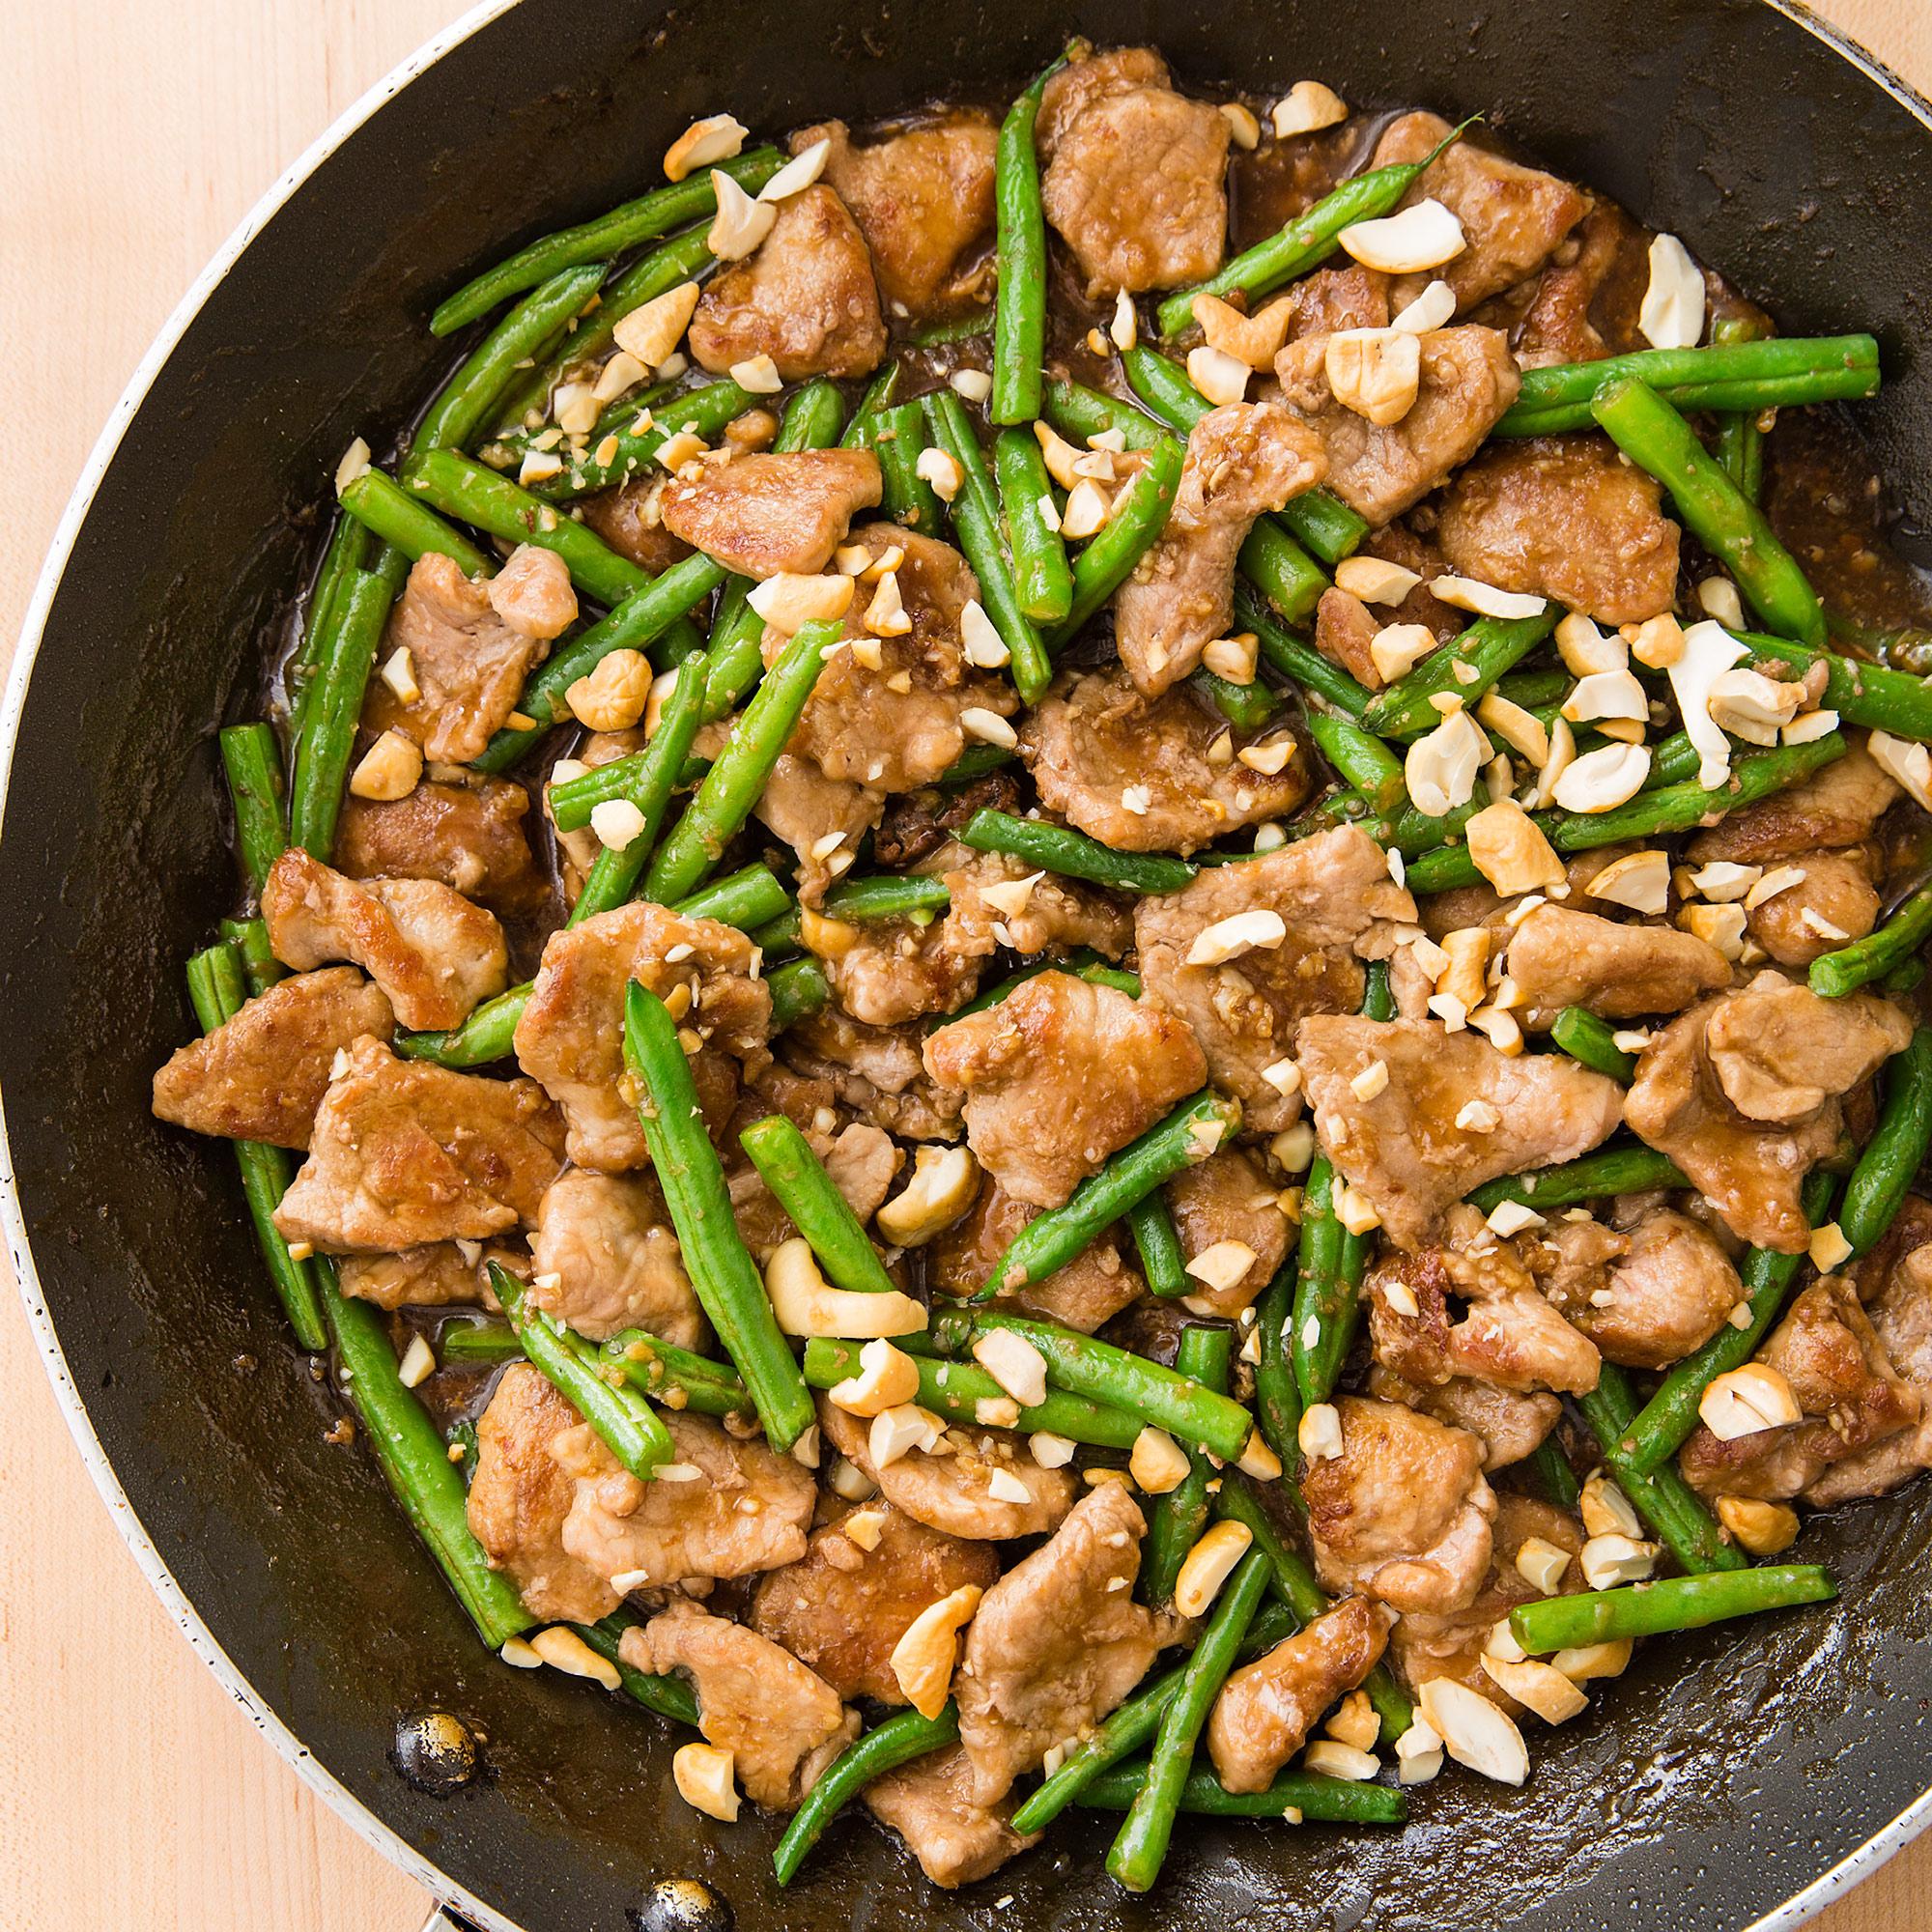 Stir-Fried Pork with Green Beans and Cashews